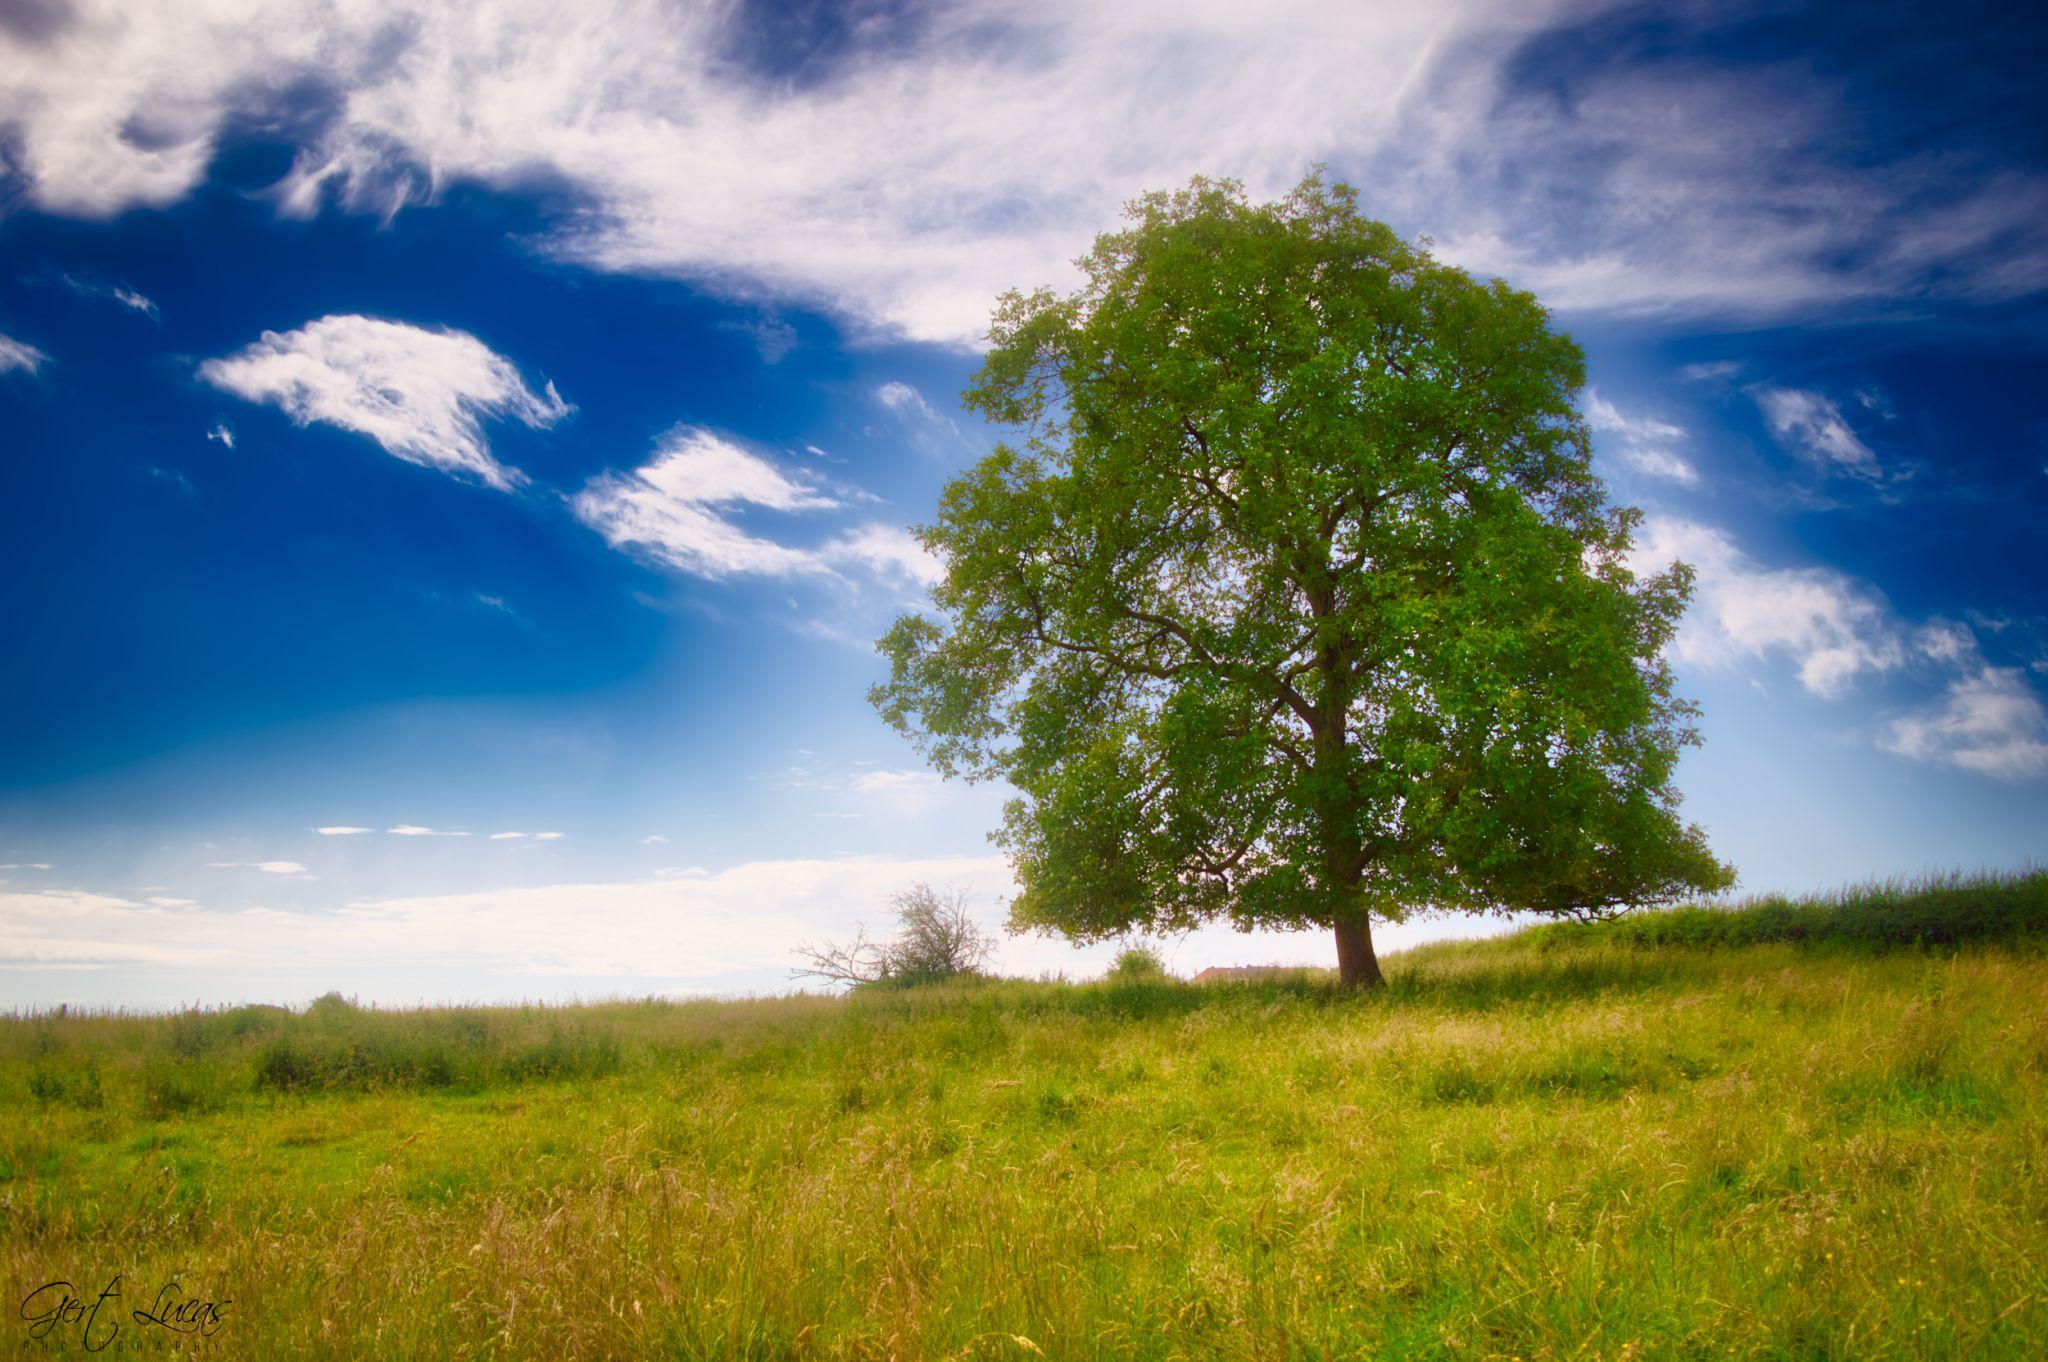 Alsput - The Lone Tree, Belgium